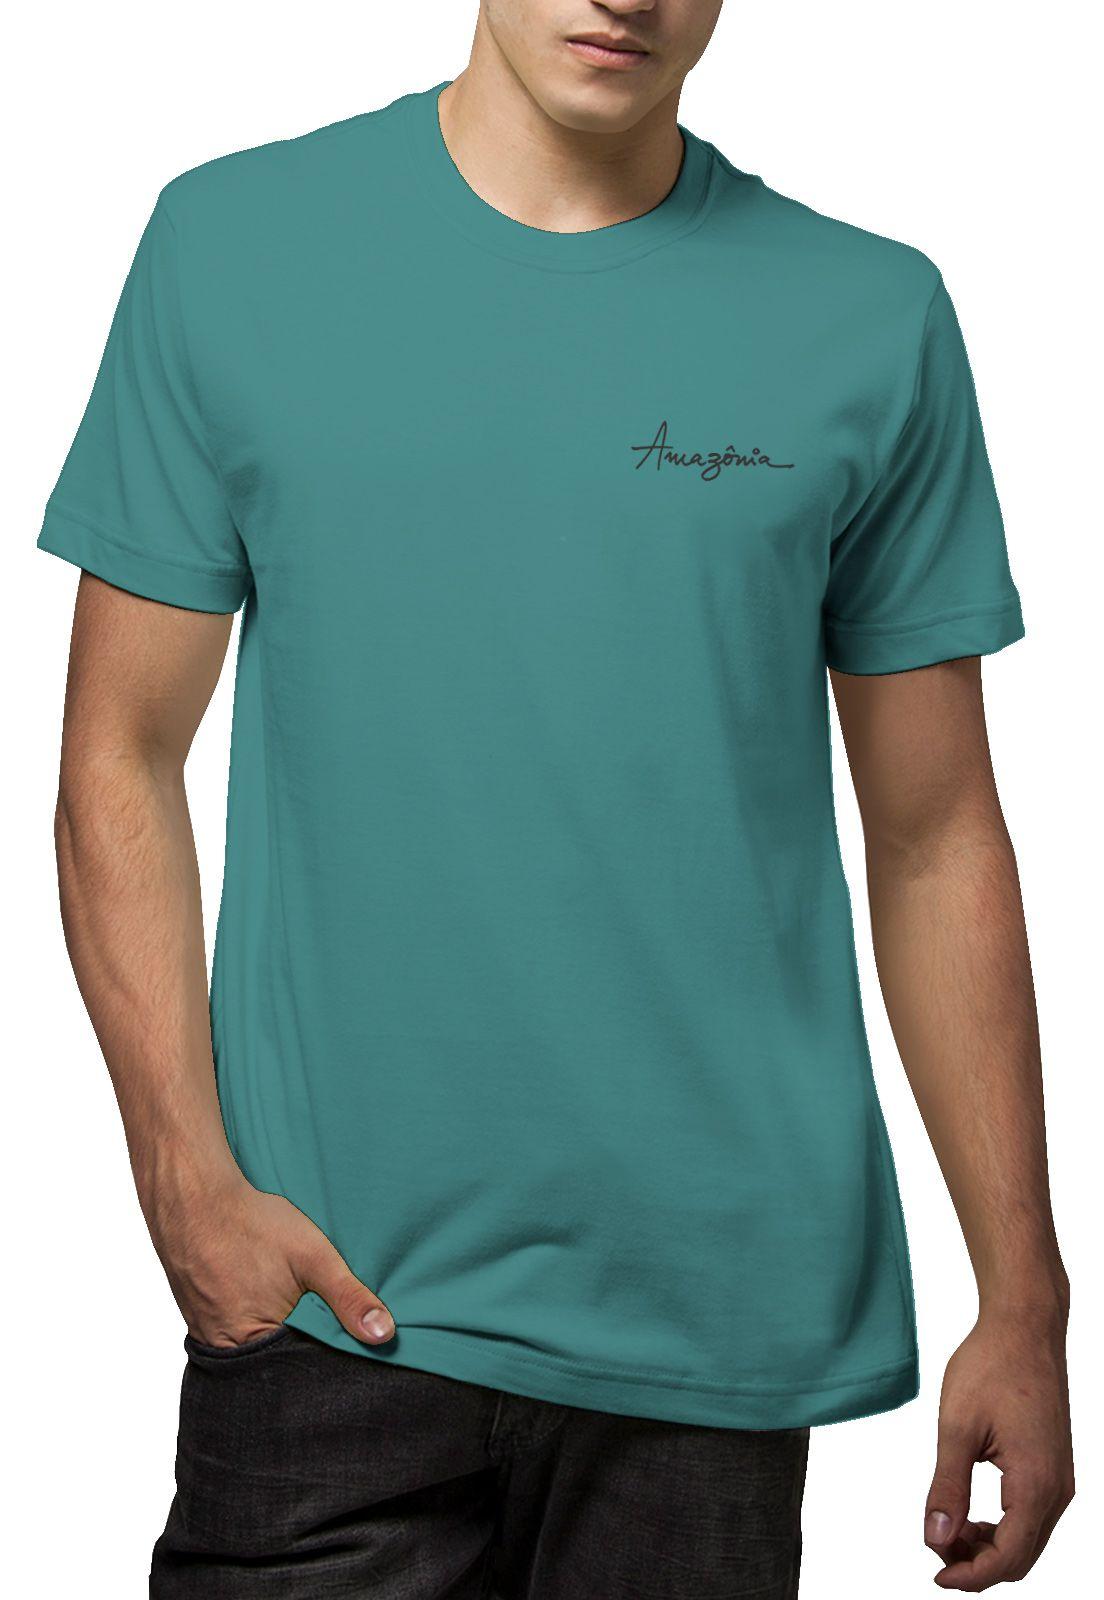 Camiseta Amazônia Folha Grande - Azul